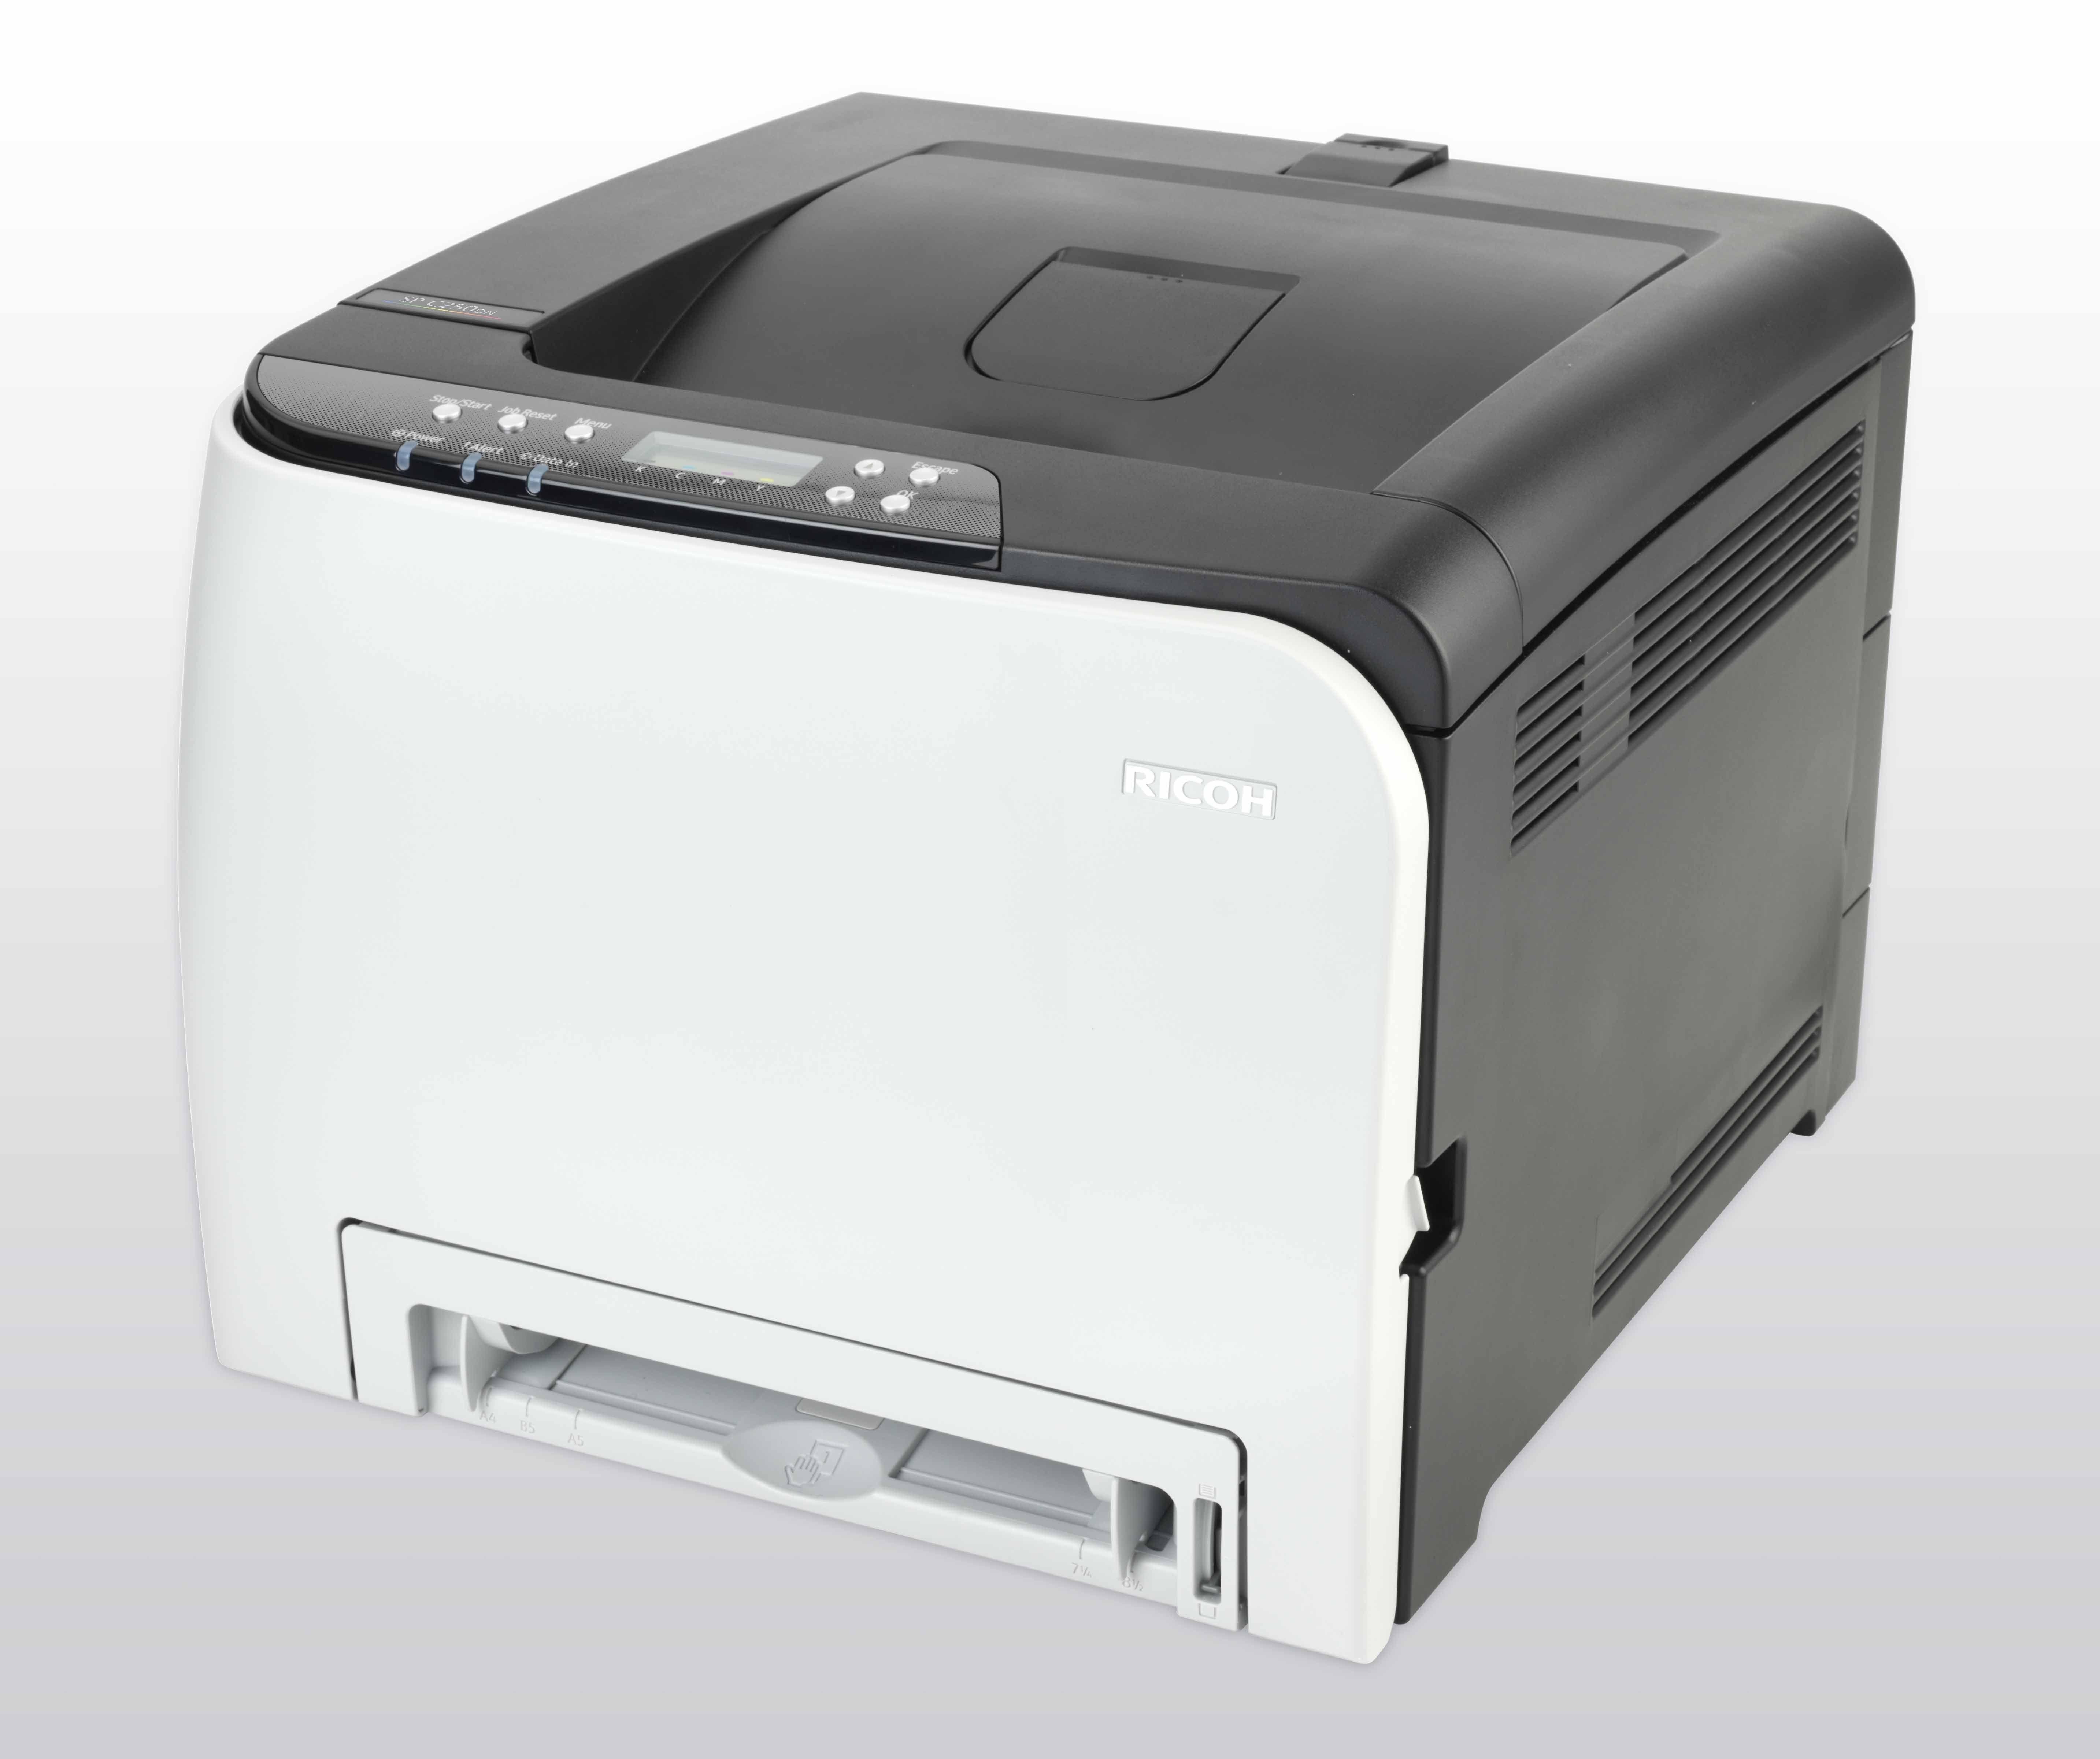 Colour Laser Printer In India Laser Printer Printer Printer Types